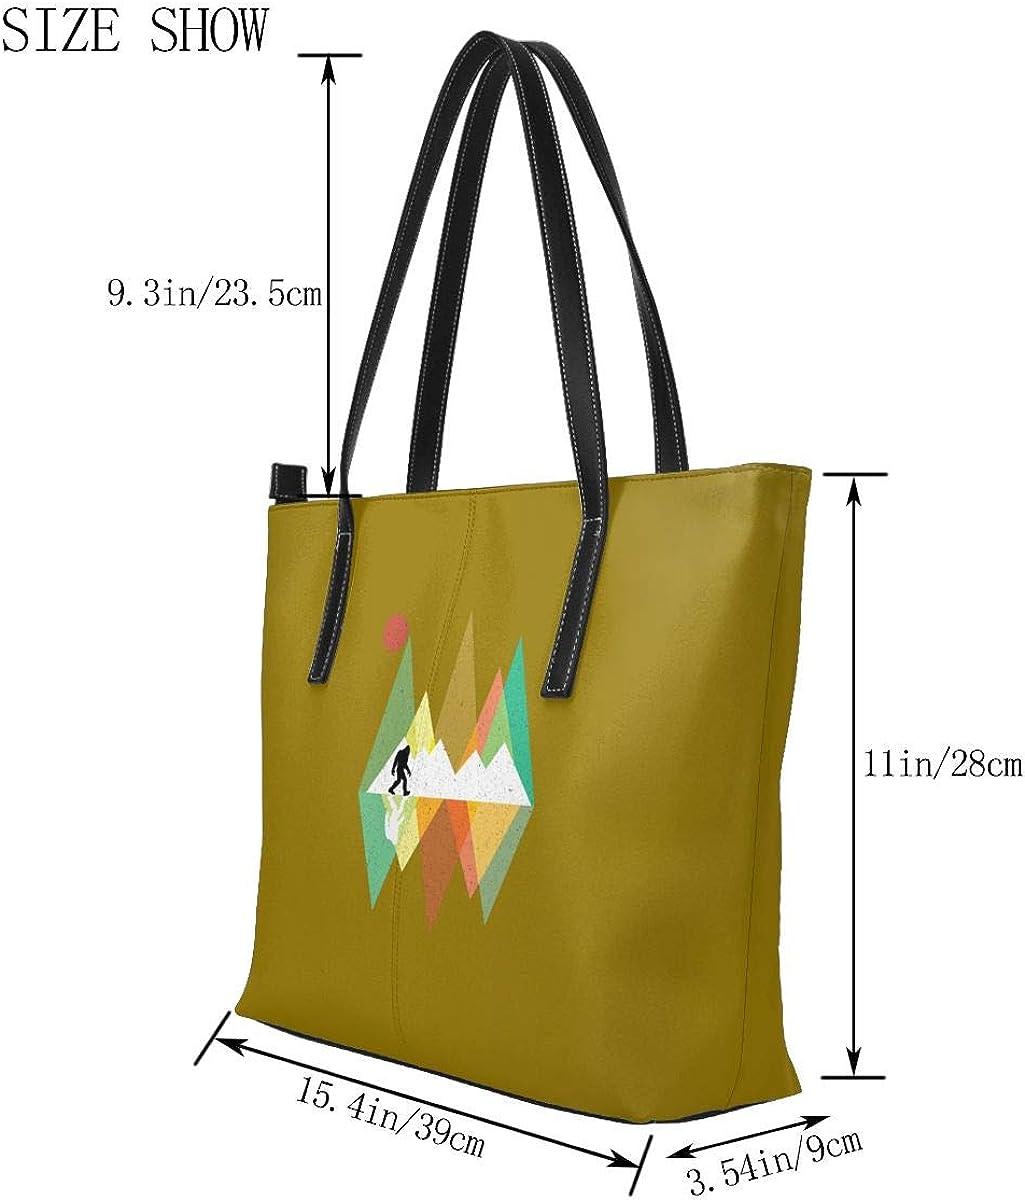 Bigfoot Geometric Mountains Shoulder Portable Pu Leather Casual Handbag Tote Personalized Ladies Fashion Bag For Women